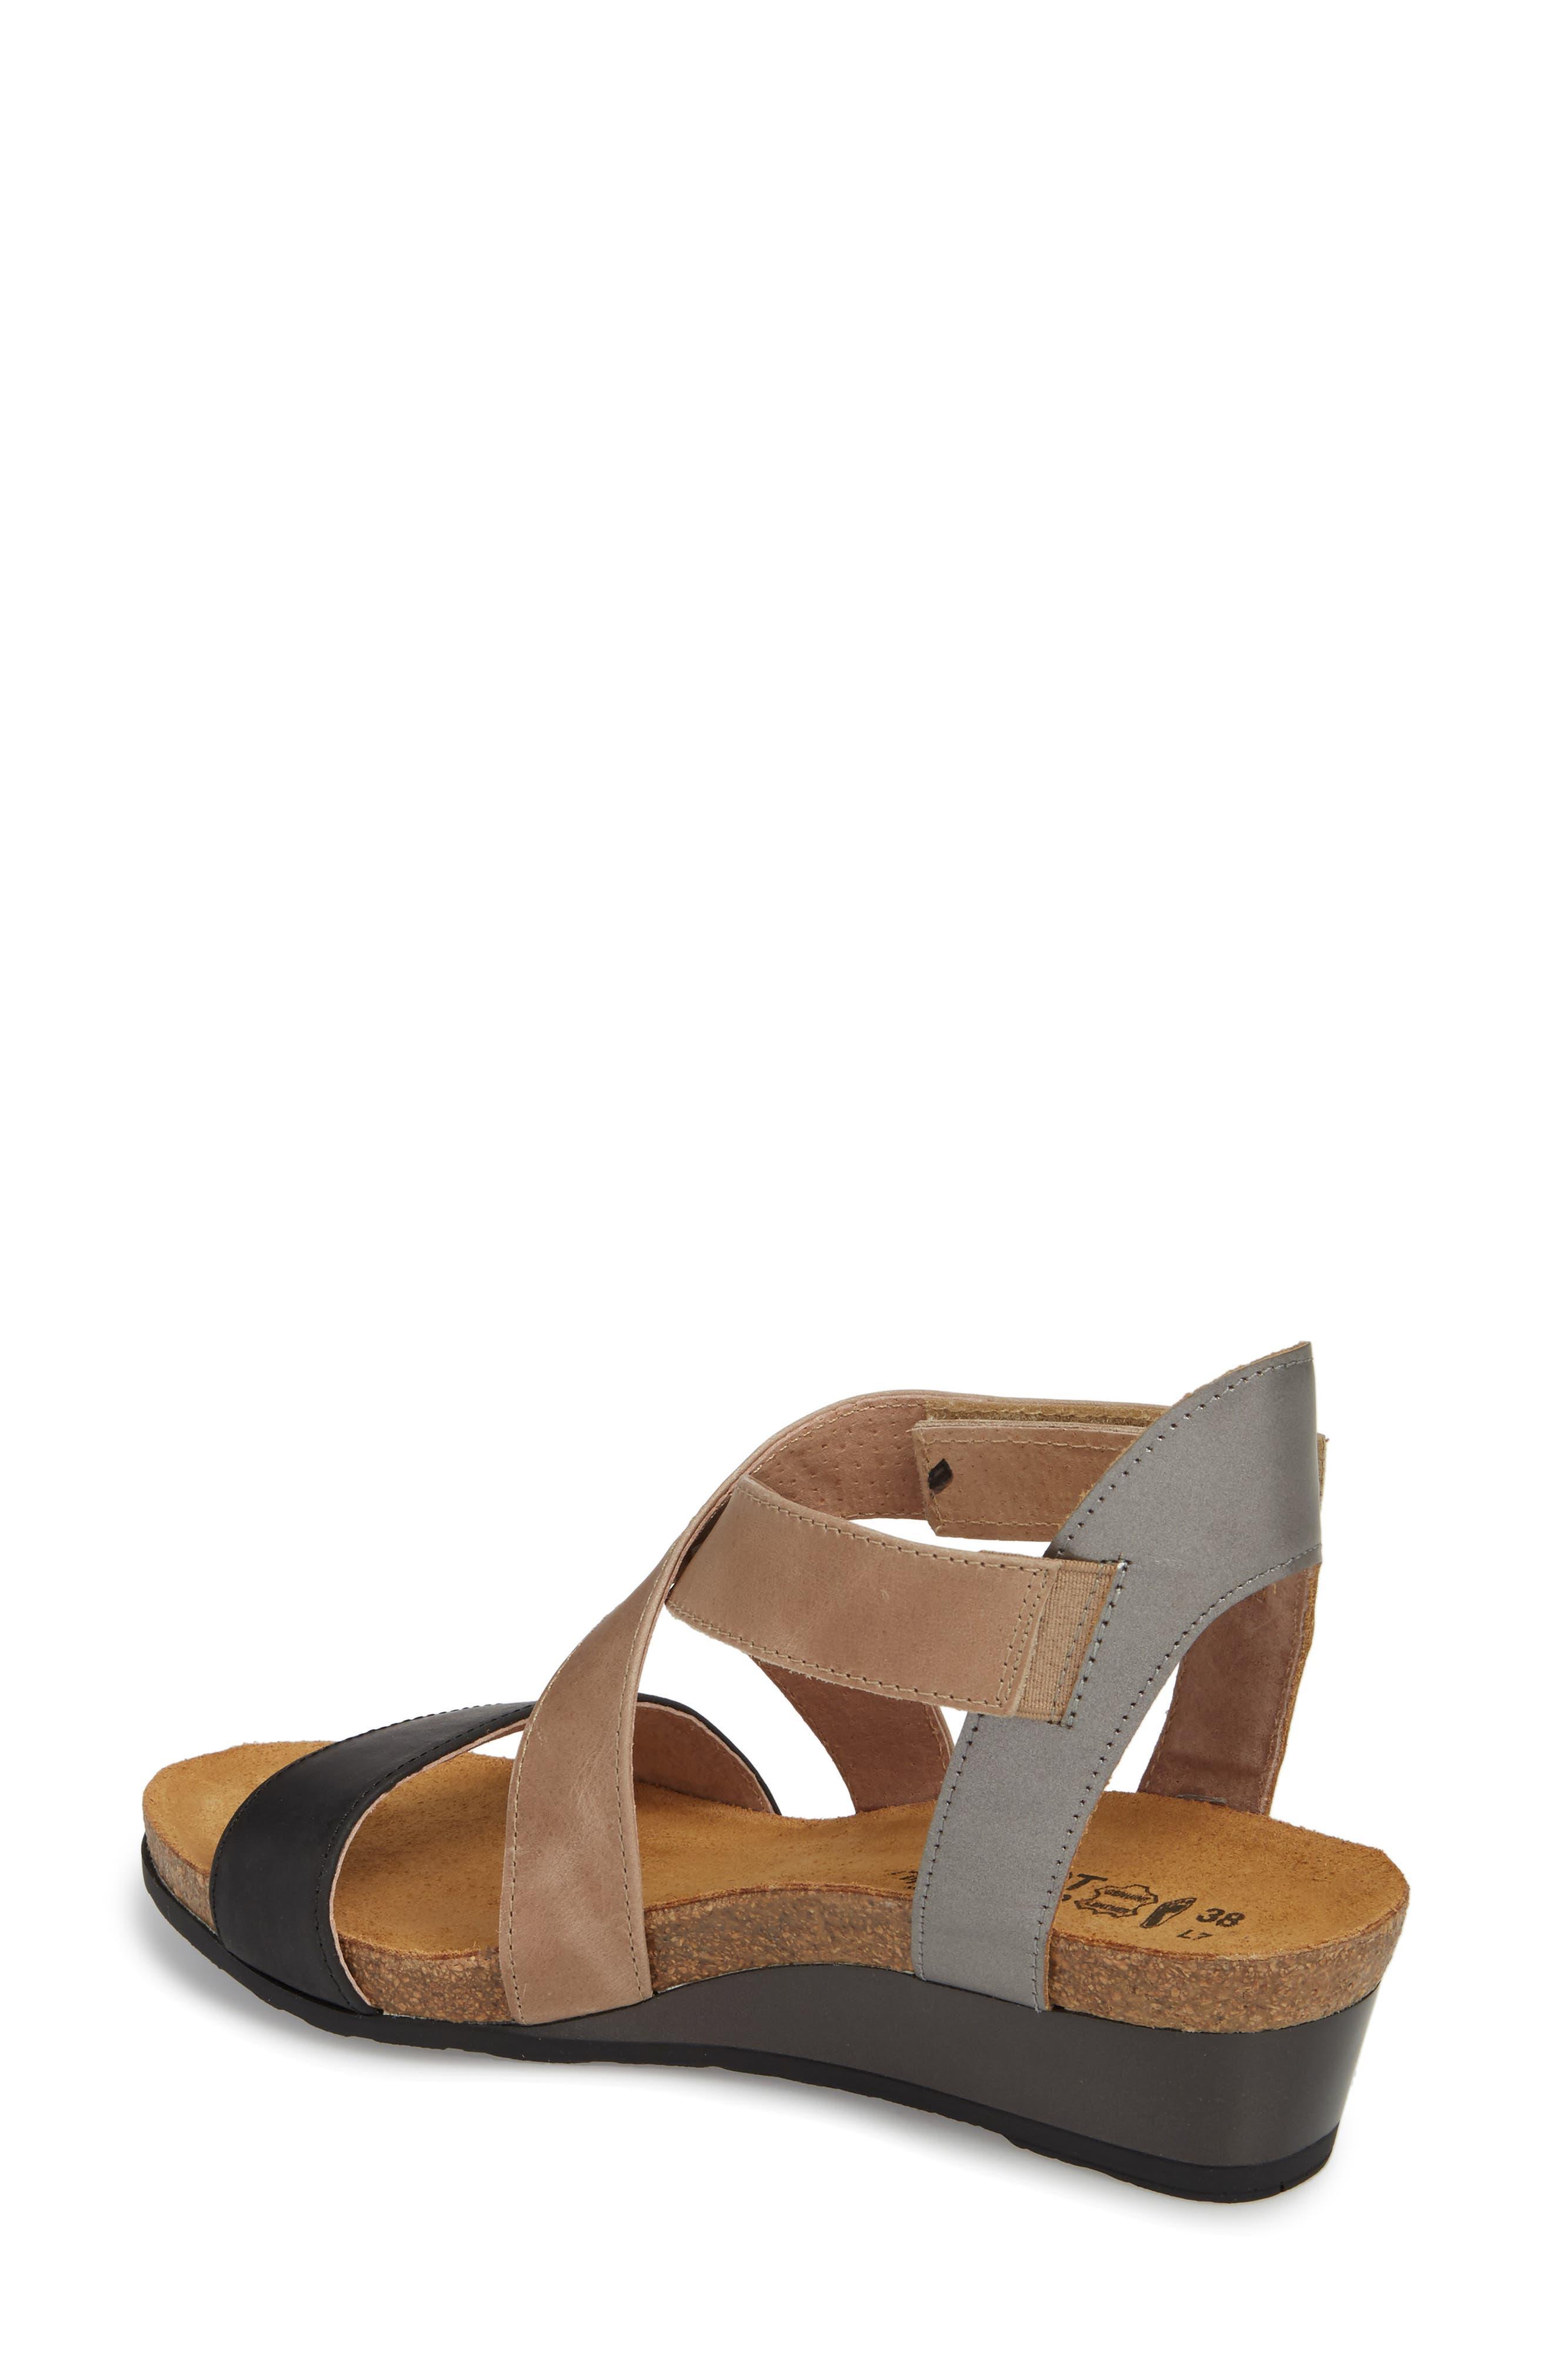 NAOT, Vixen Wedge Sandal, Alternate thumbnail 2, color, OILY COAL LEATHER